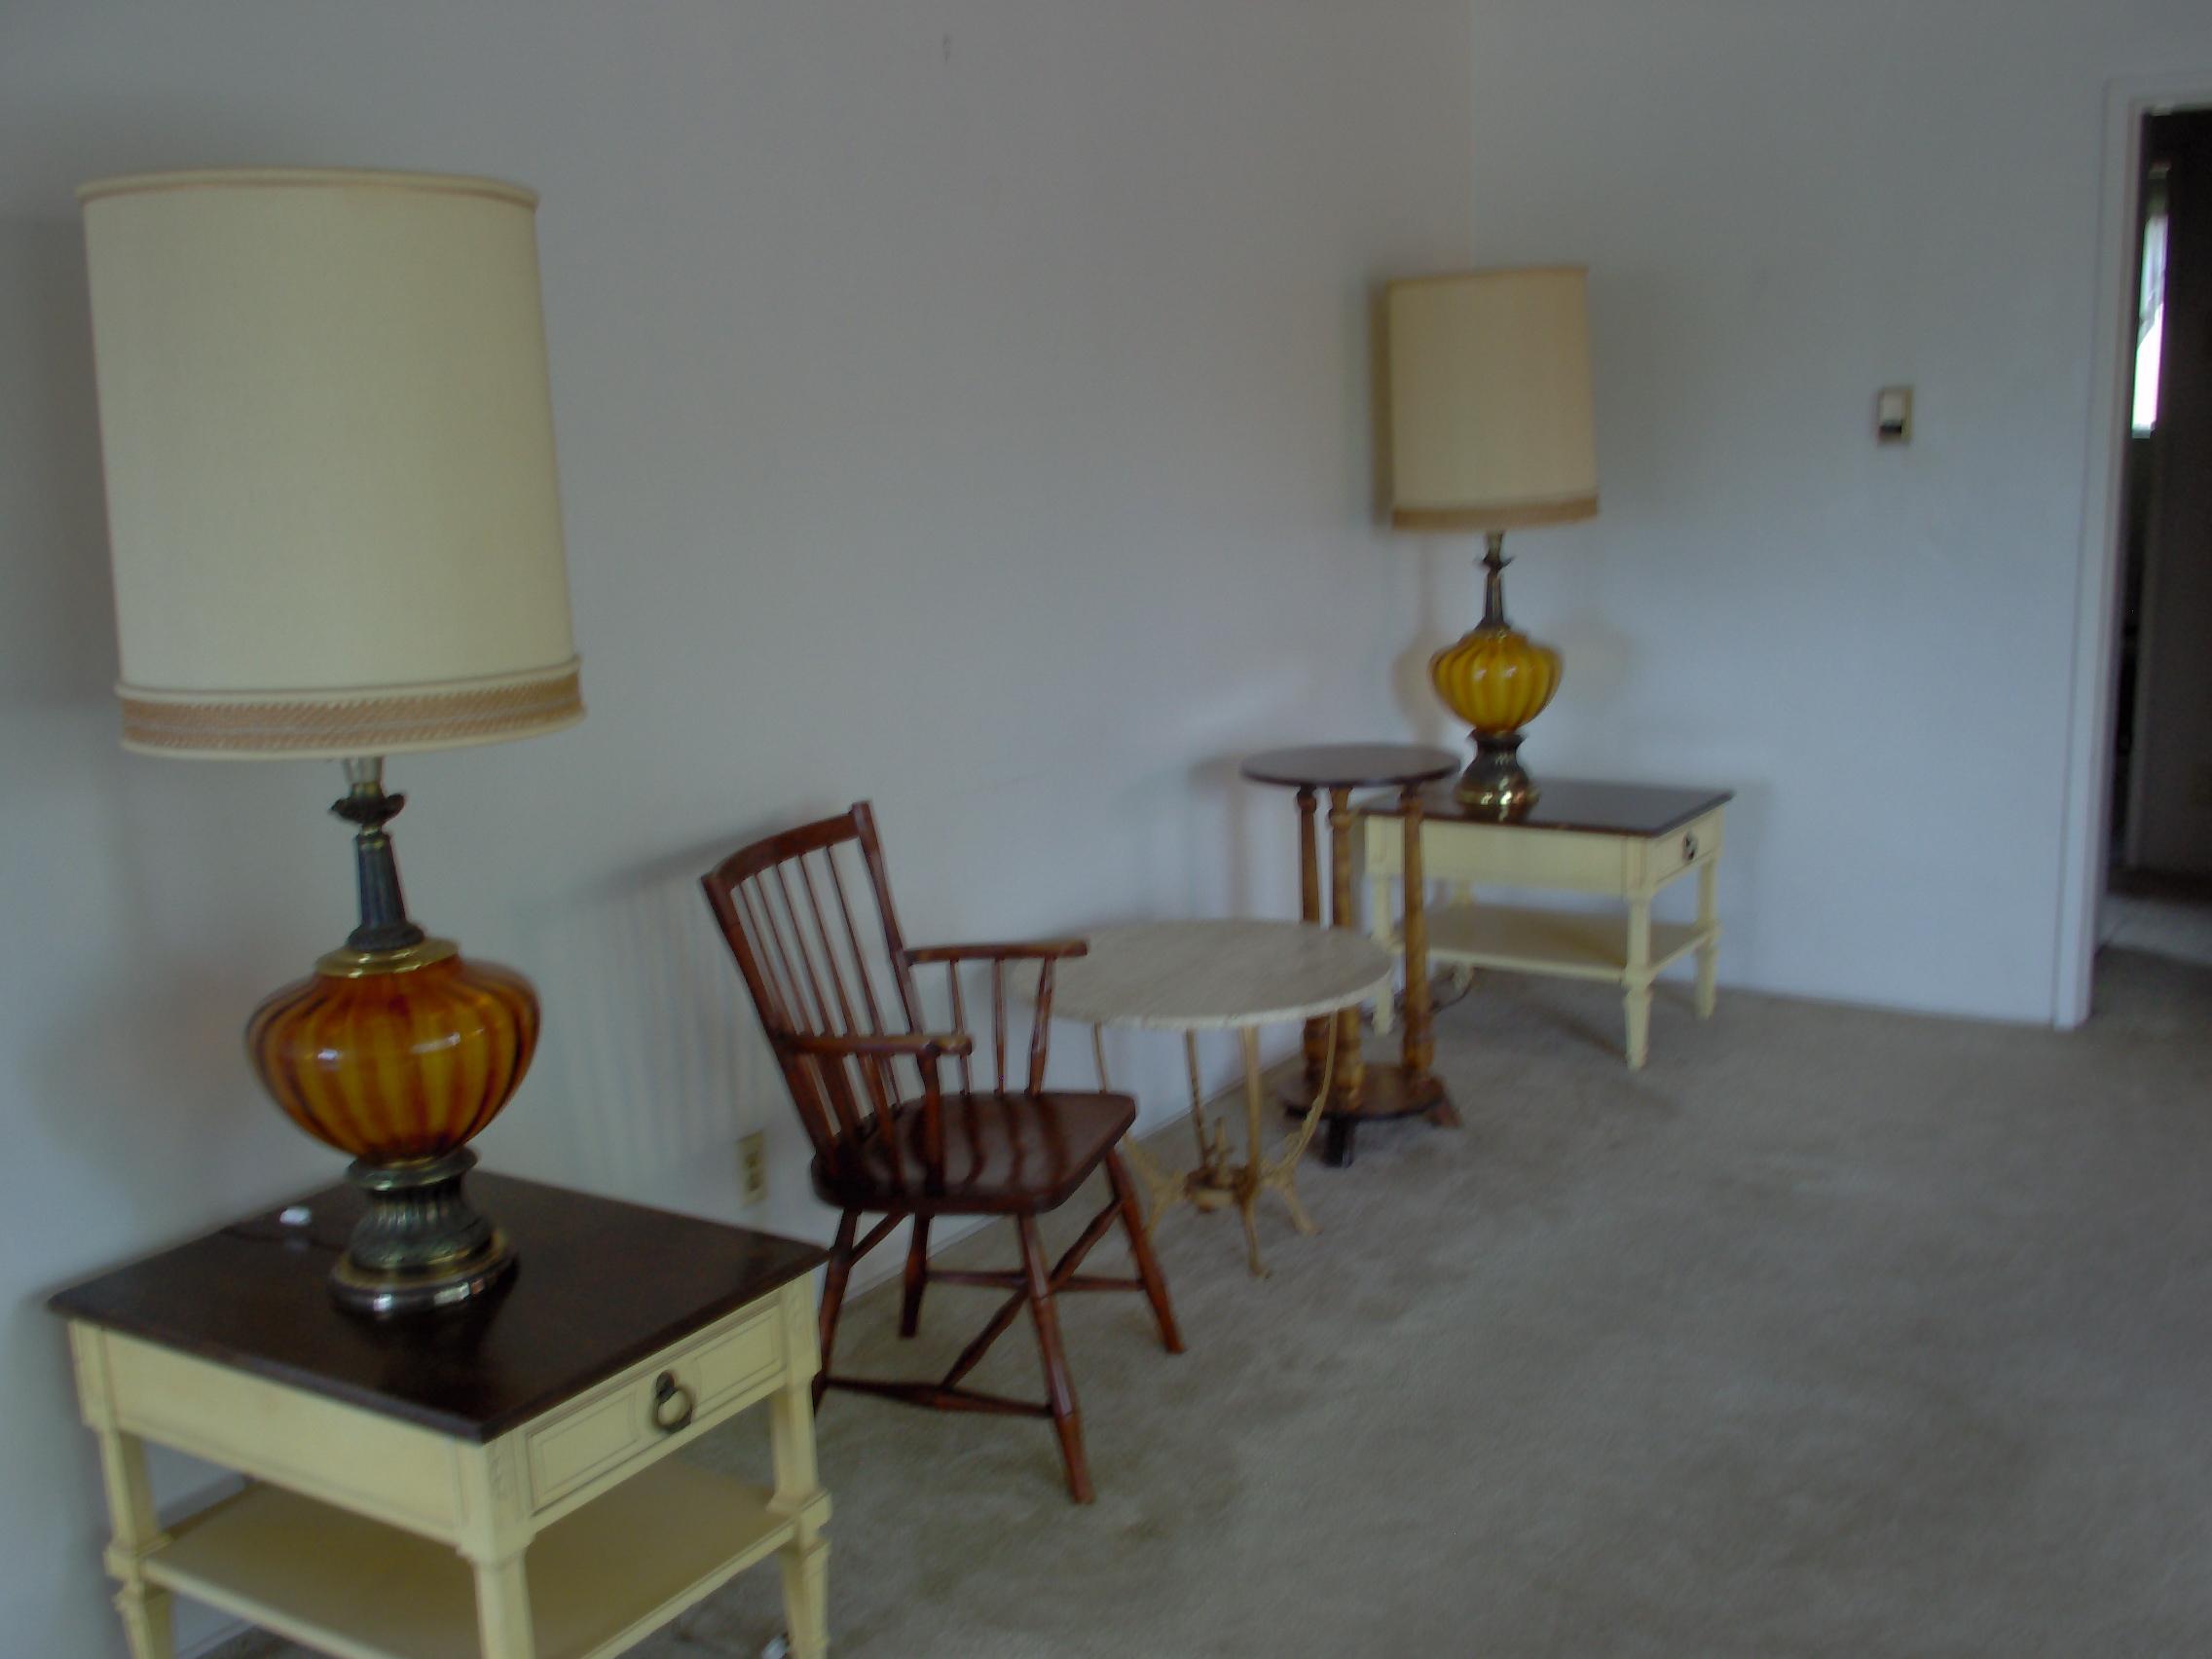 Antique mid centry furniture